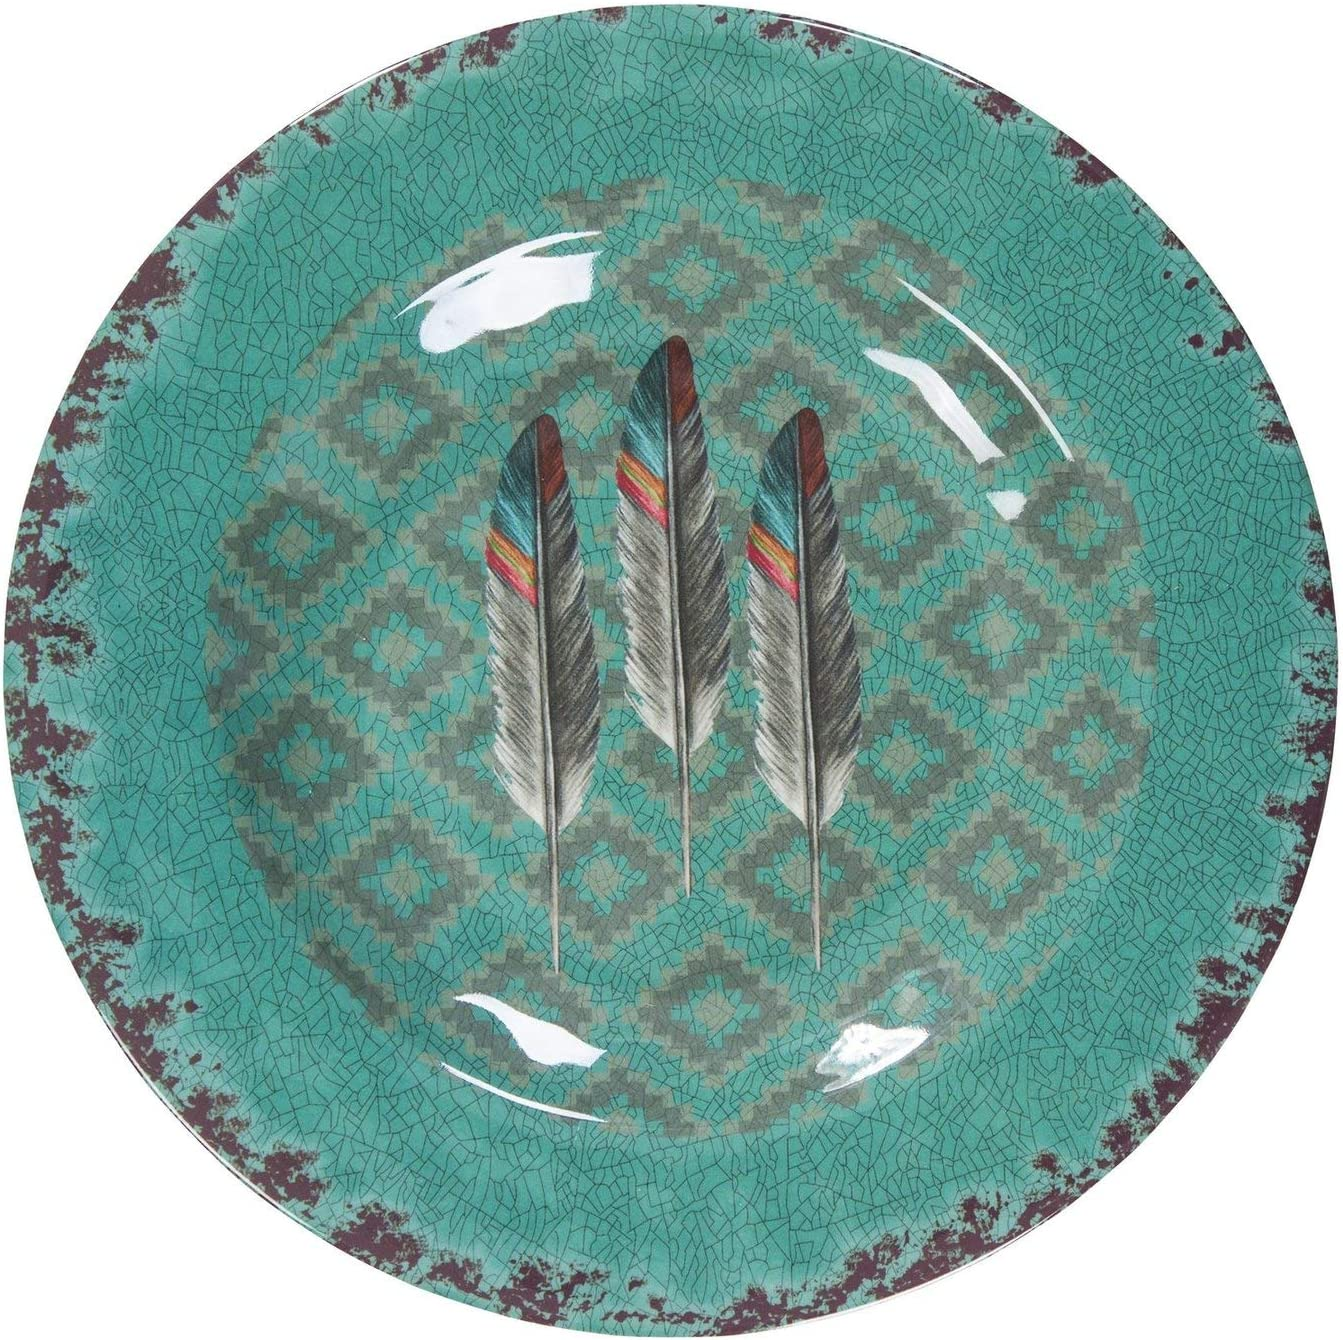 Amazon Com Hiend Accents Feather Southwestern 14 Pc Melamine Dinnerware Set Terra Cotta Turquoise Beige Dinnerware Sets